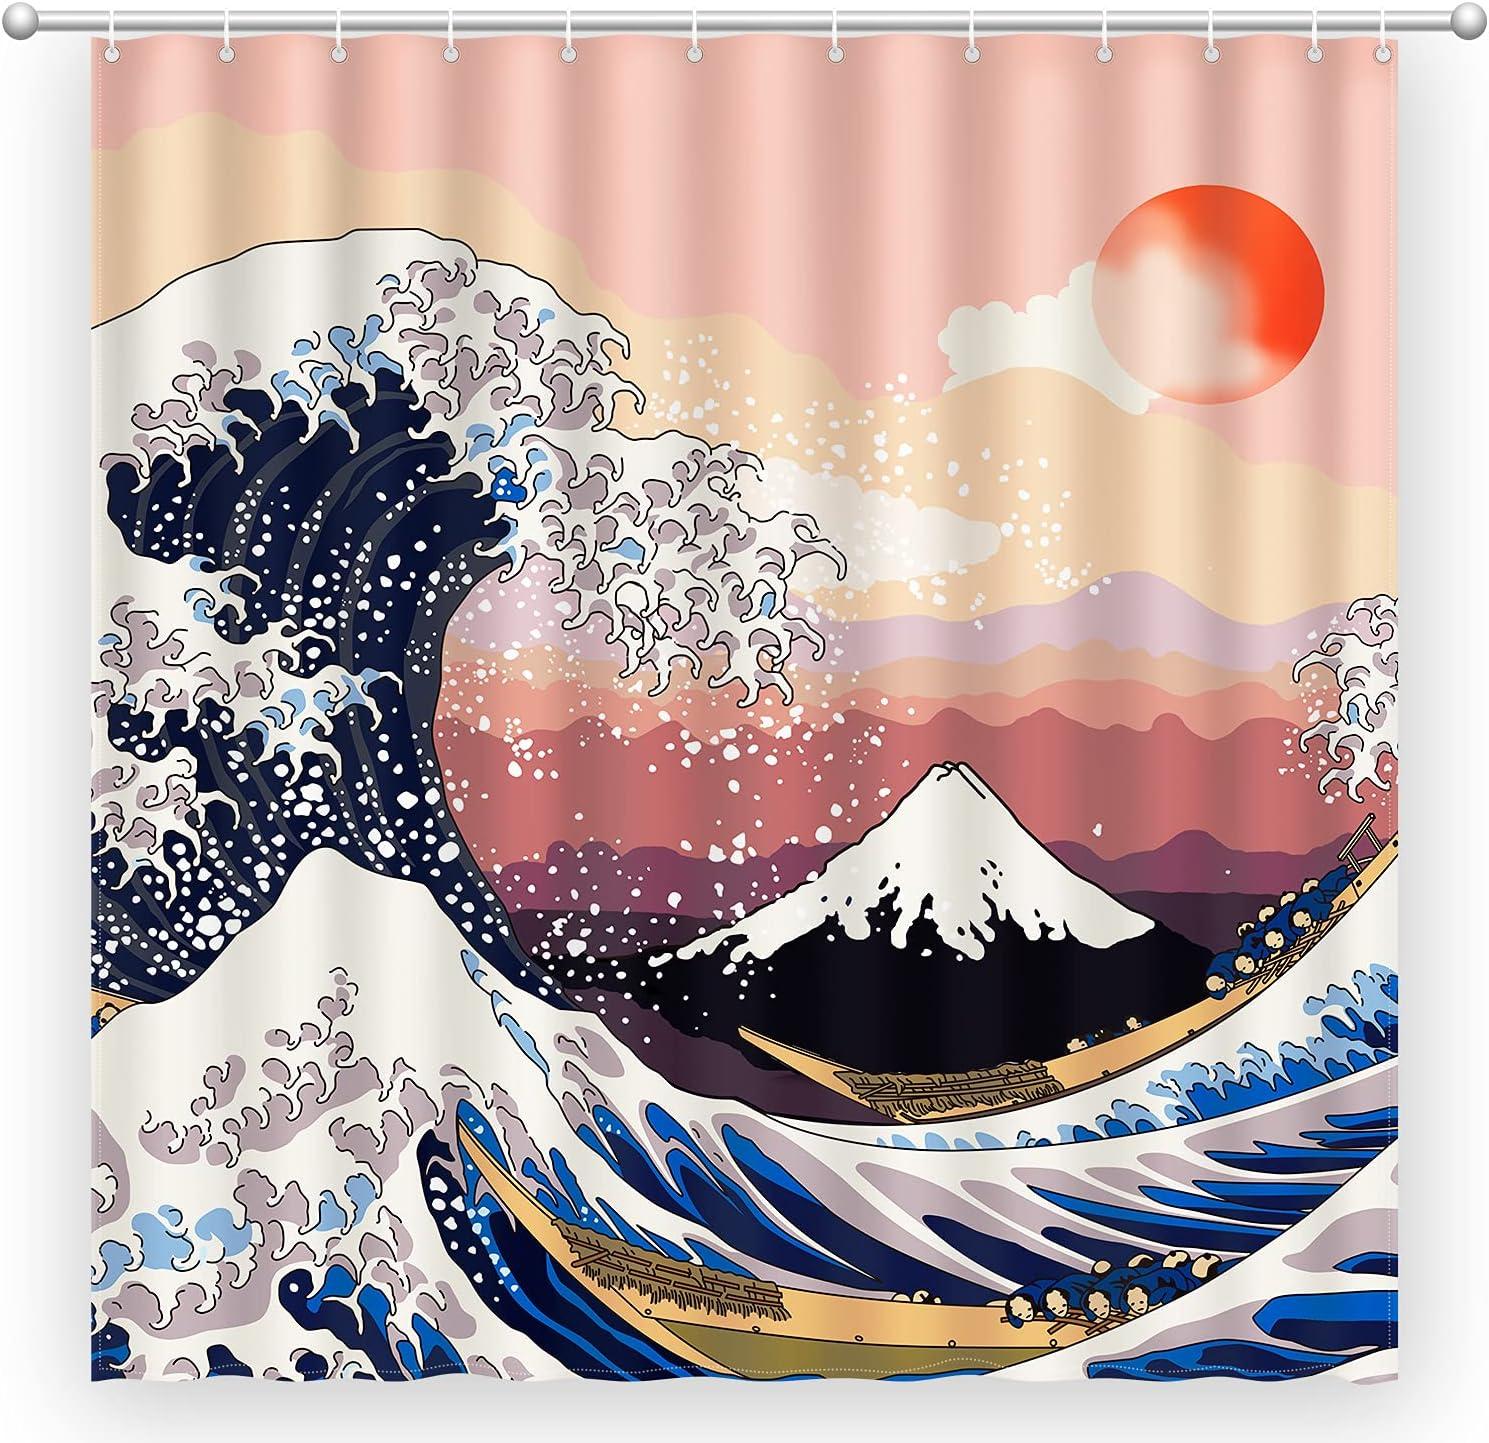 Bathroom Shower Curtain Sets with Hooks, Lokigo Japanese Anime Shower Curtain Blue Great Sea Wave Mountain Sunset Glow Sky Polyester Waterproof Fabric Home Bath Curtain,72X72 Inchs